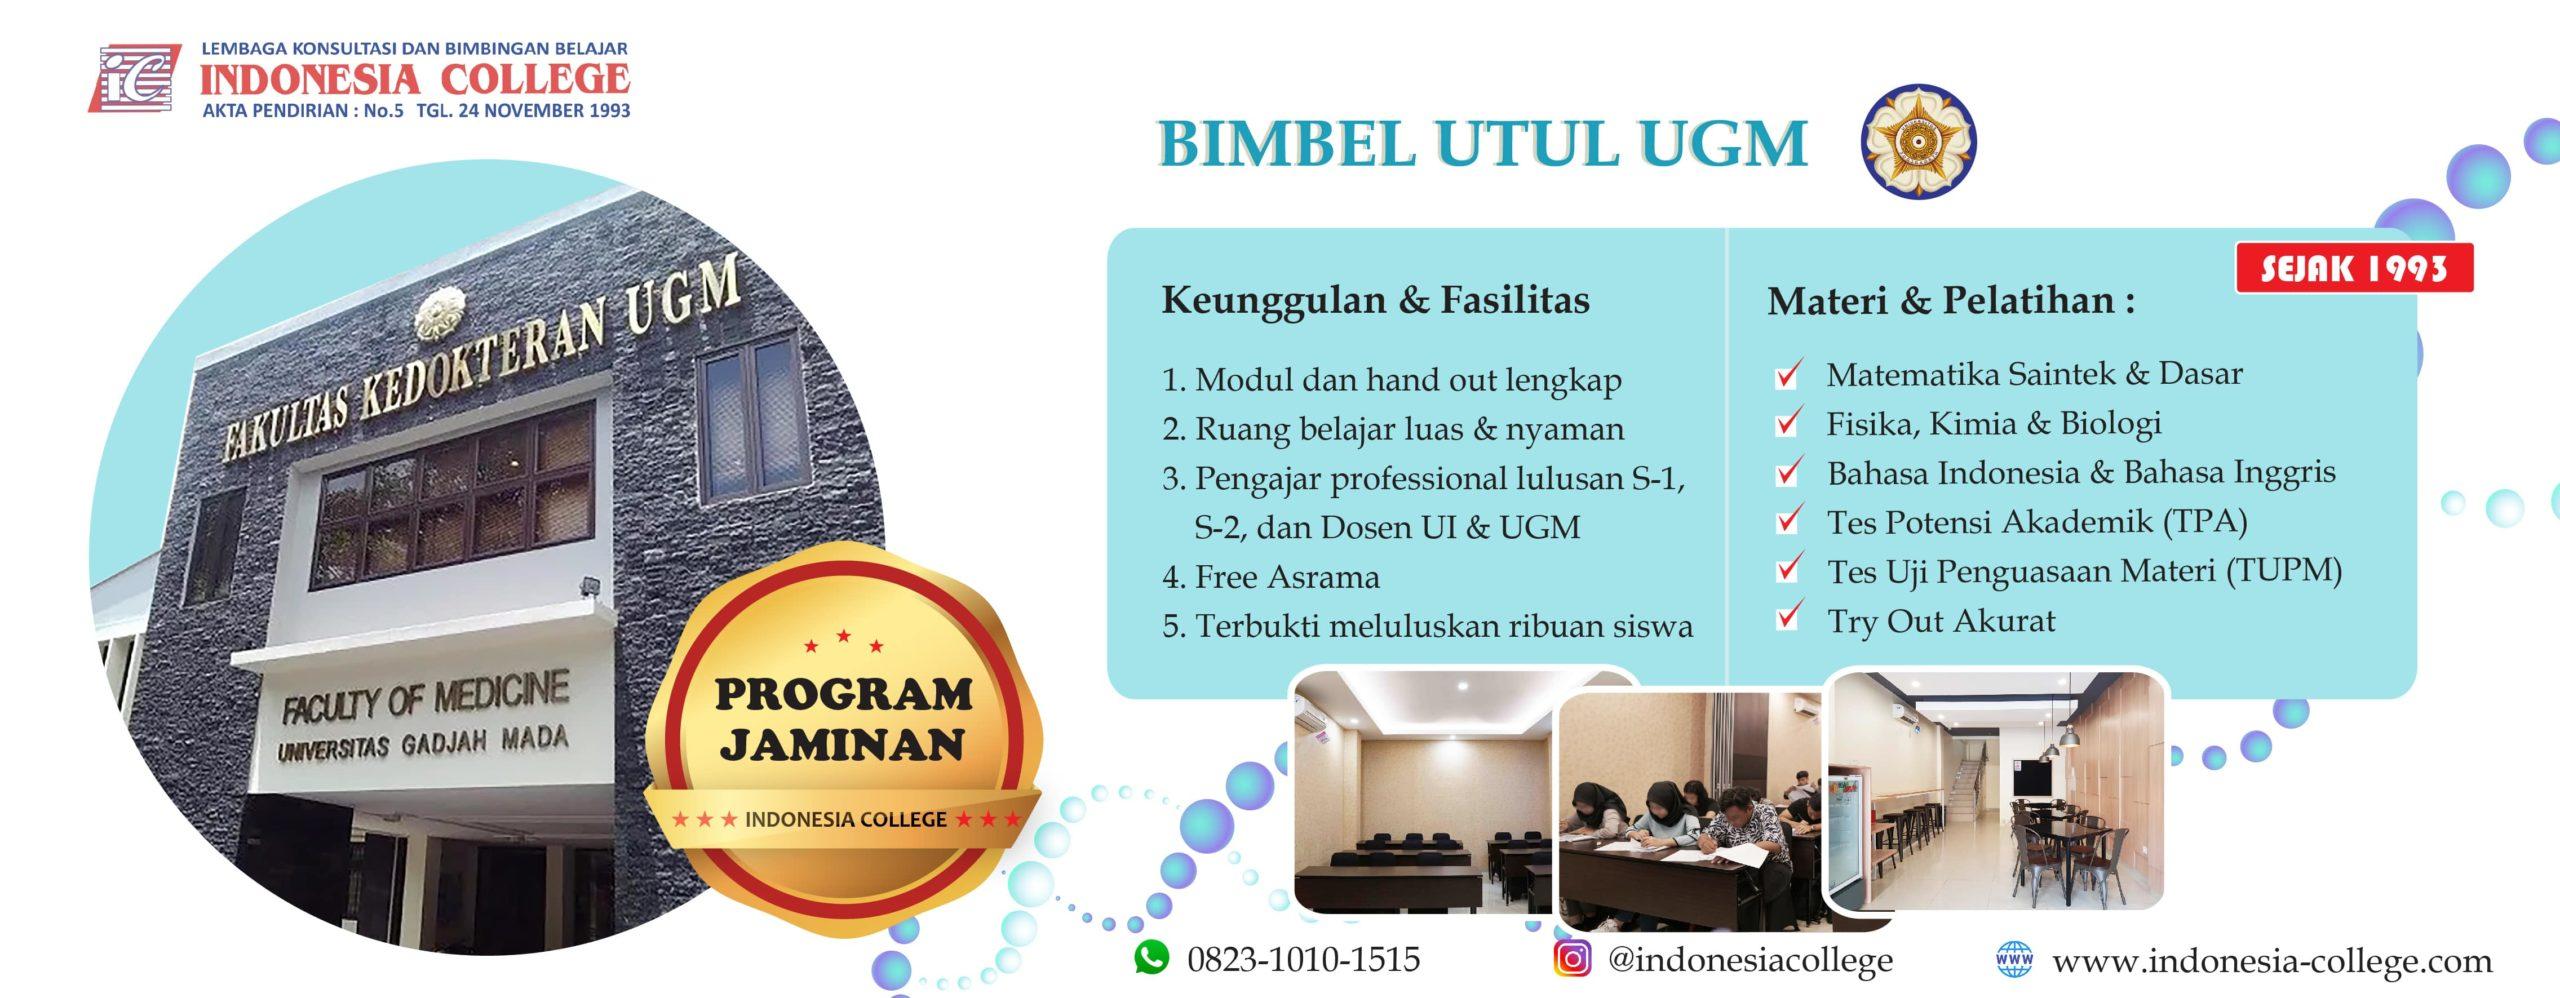 BIMBEL UTUL UGM